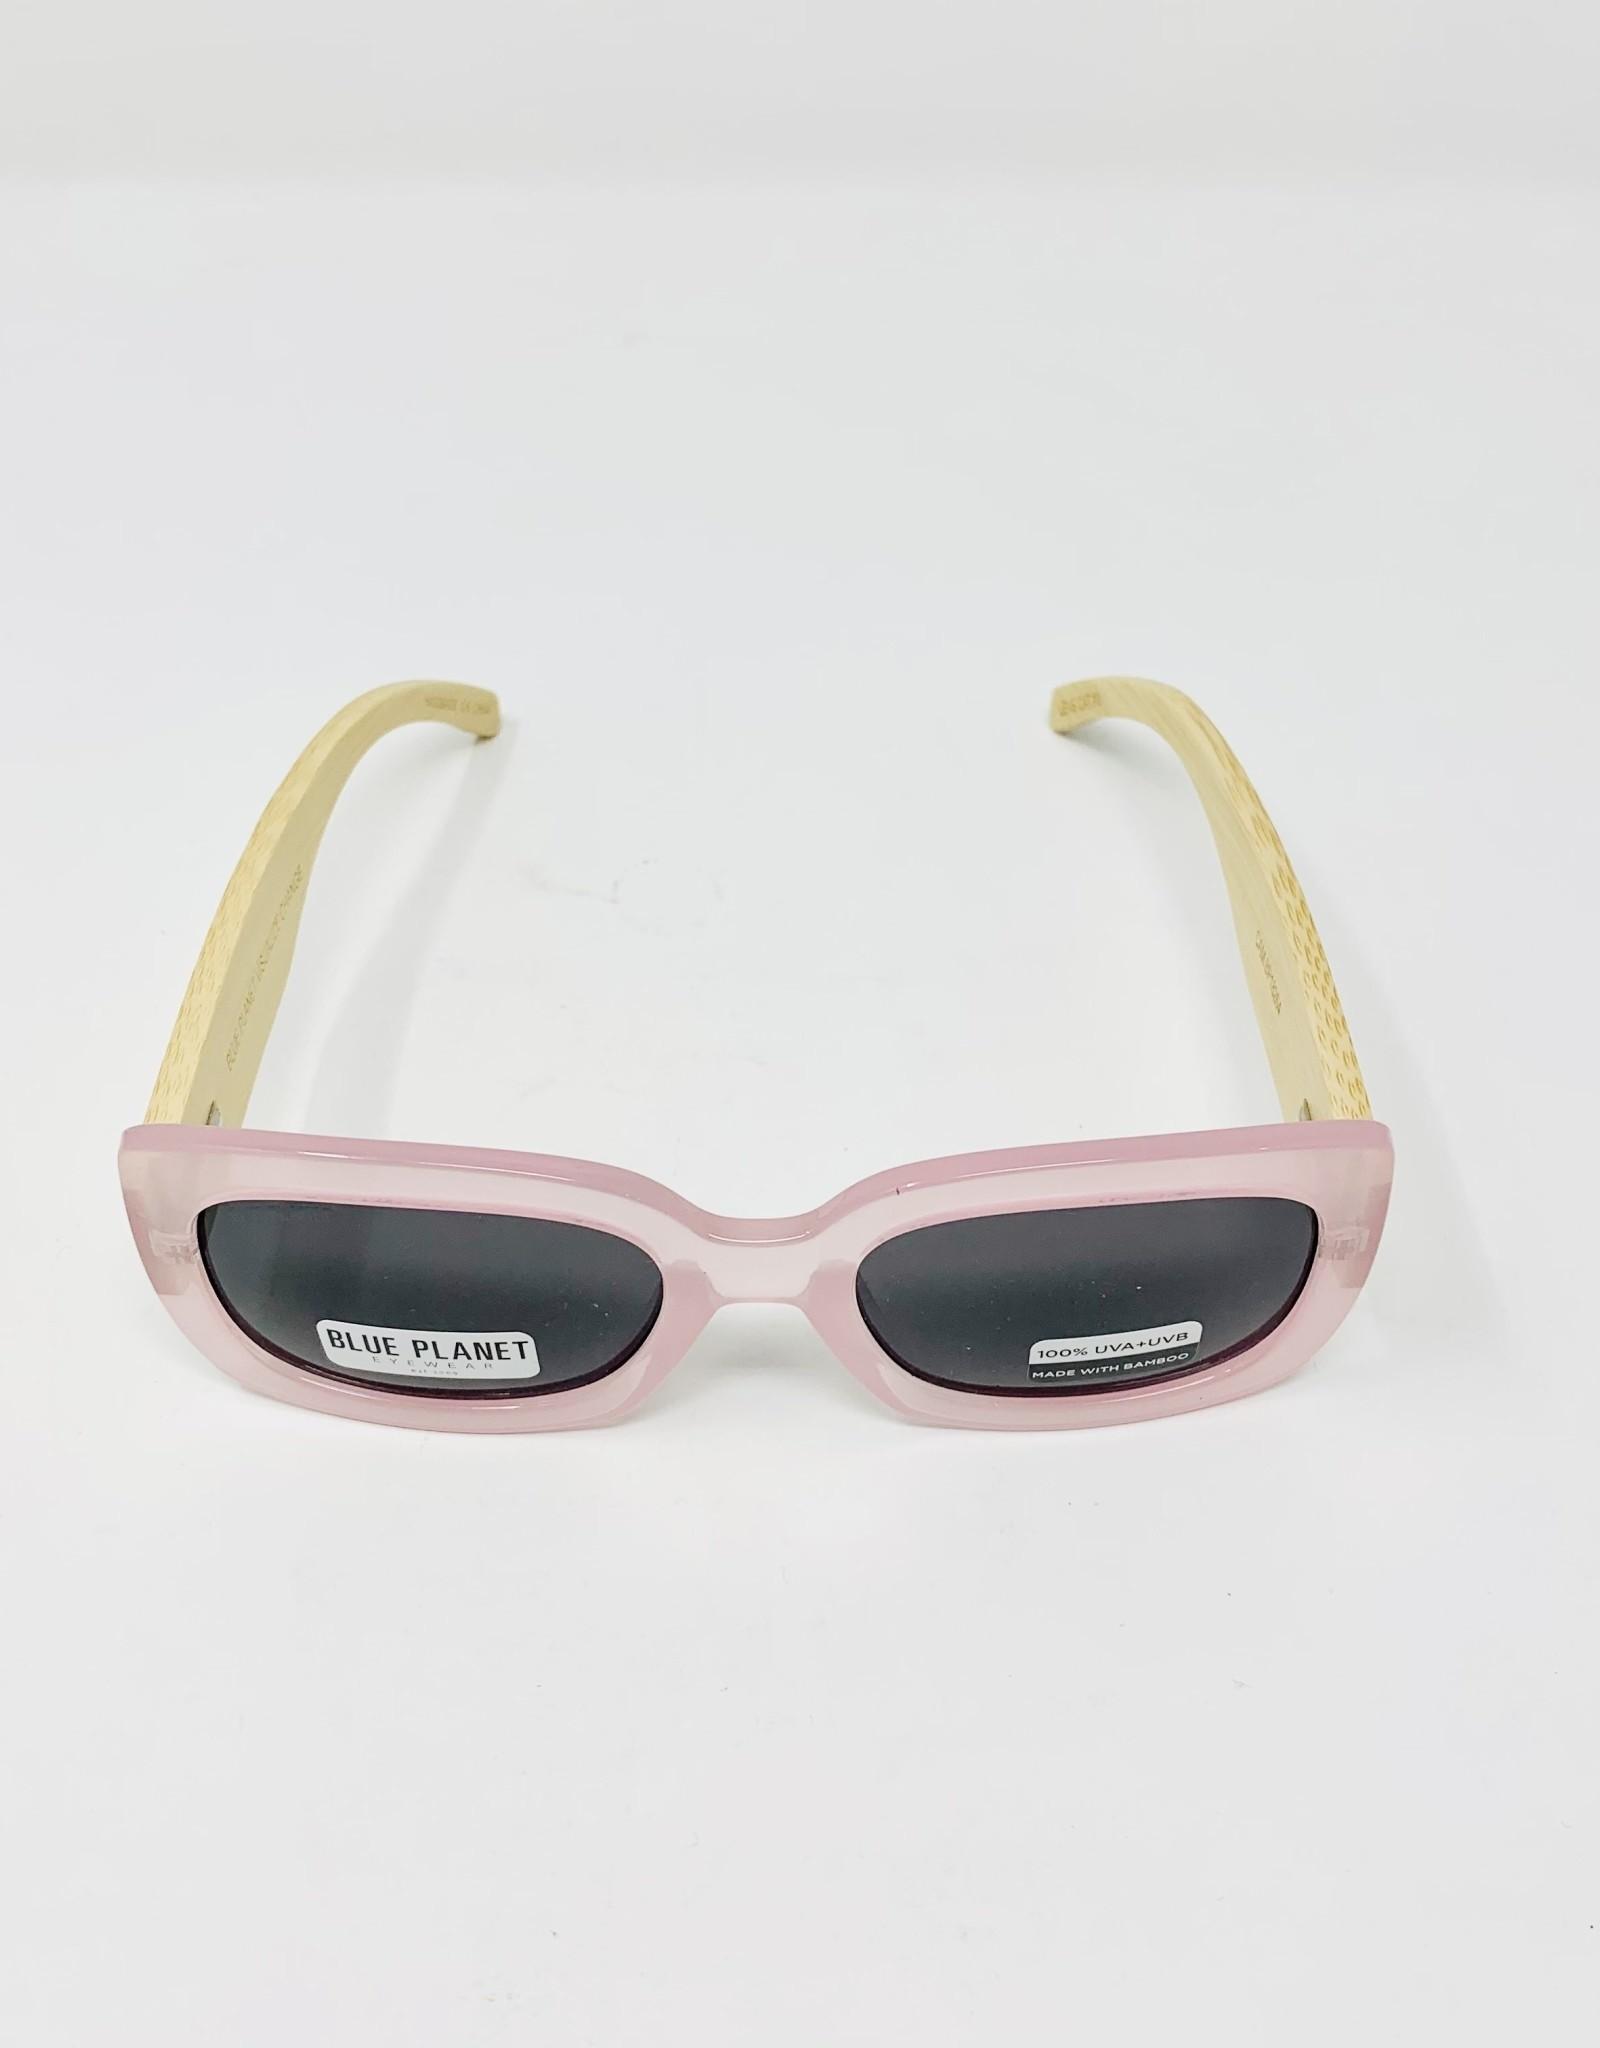 Blue Planet Eyewear Cam-Pink Sunglasses